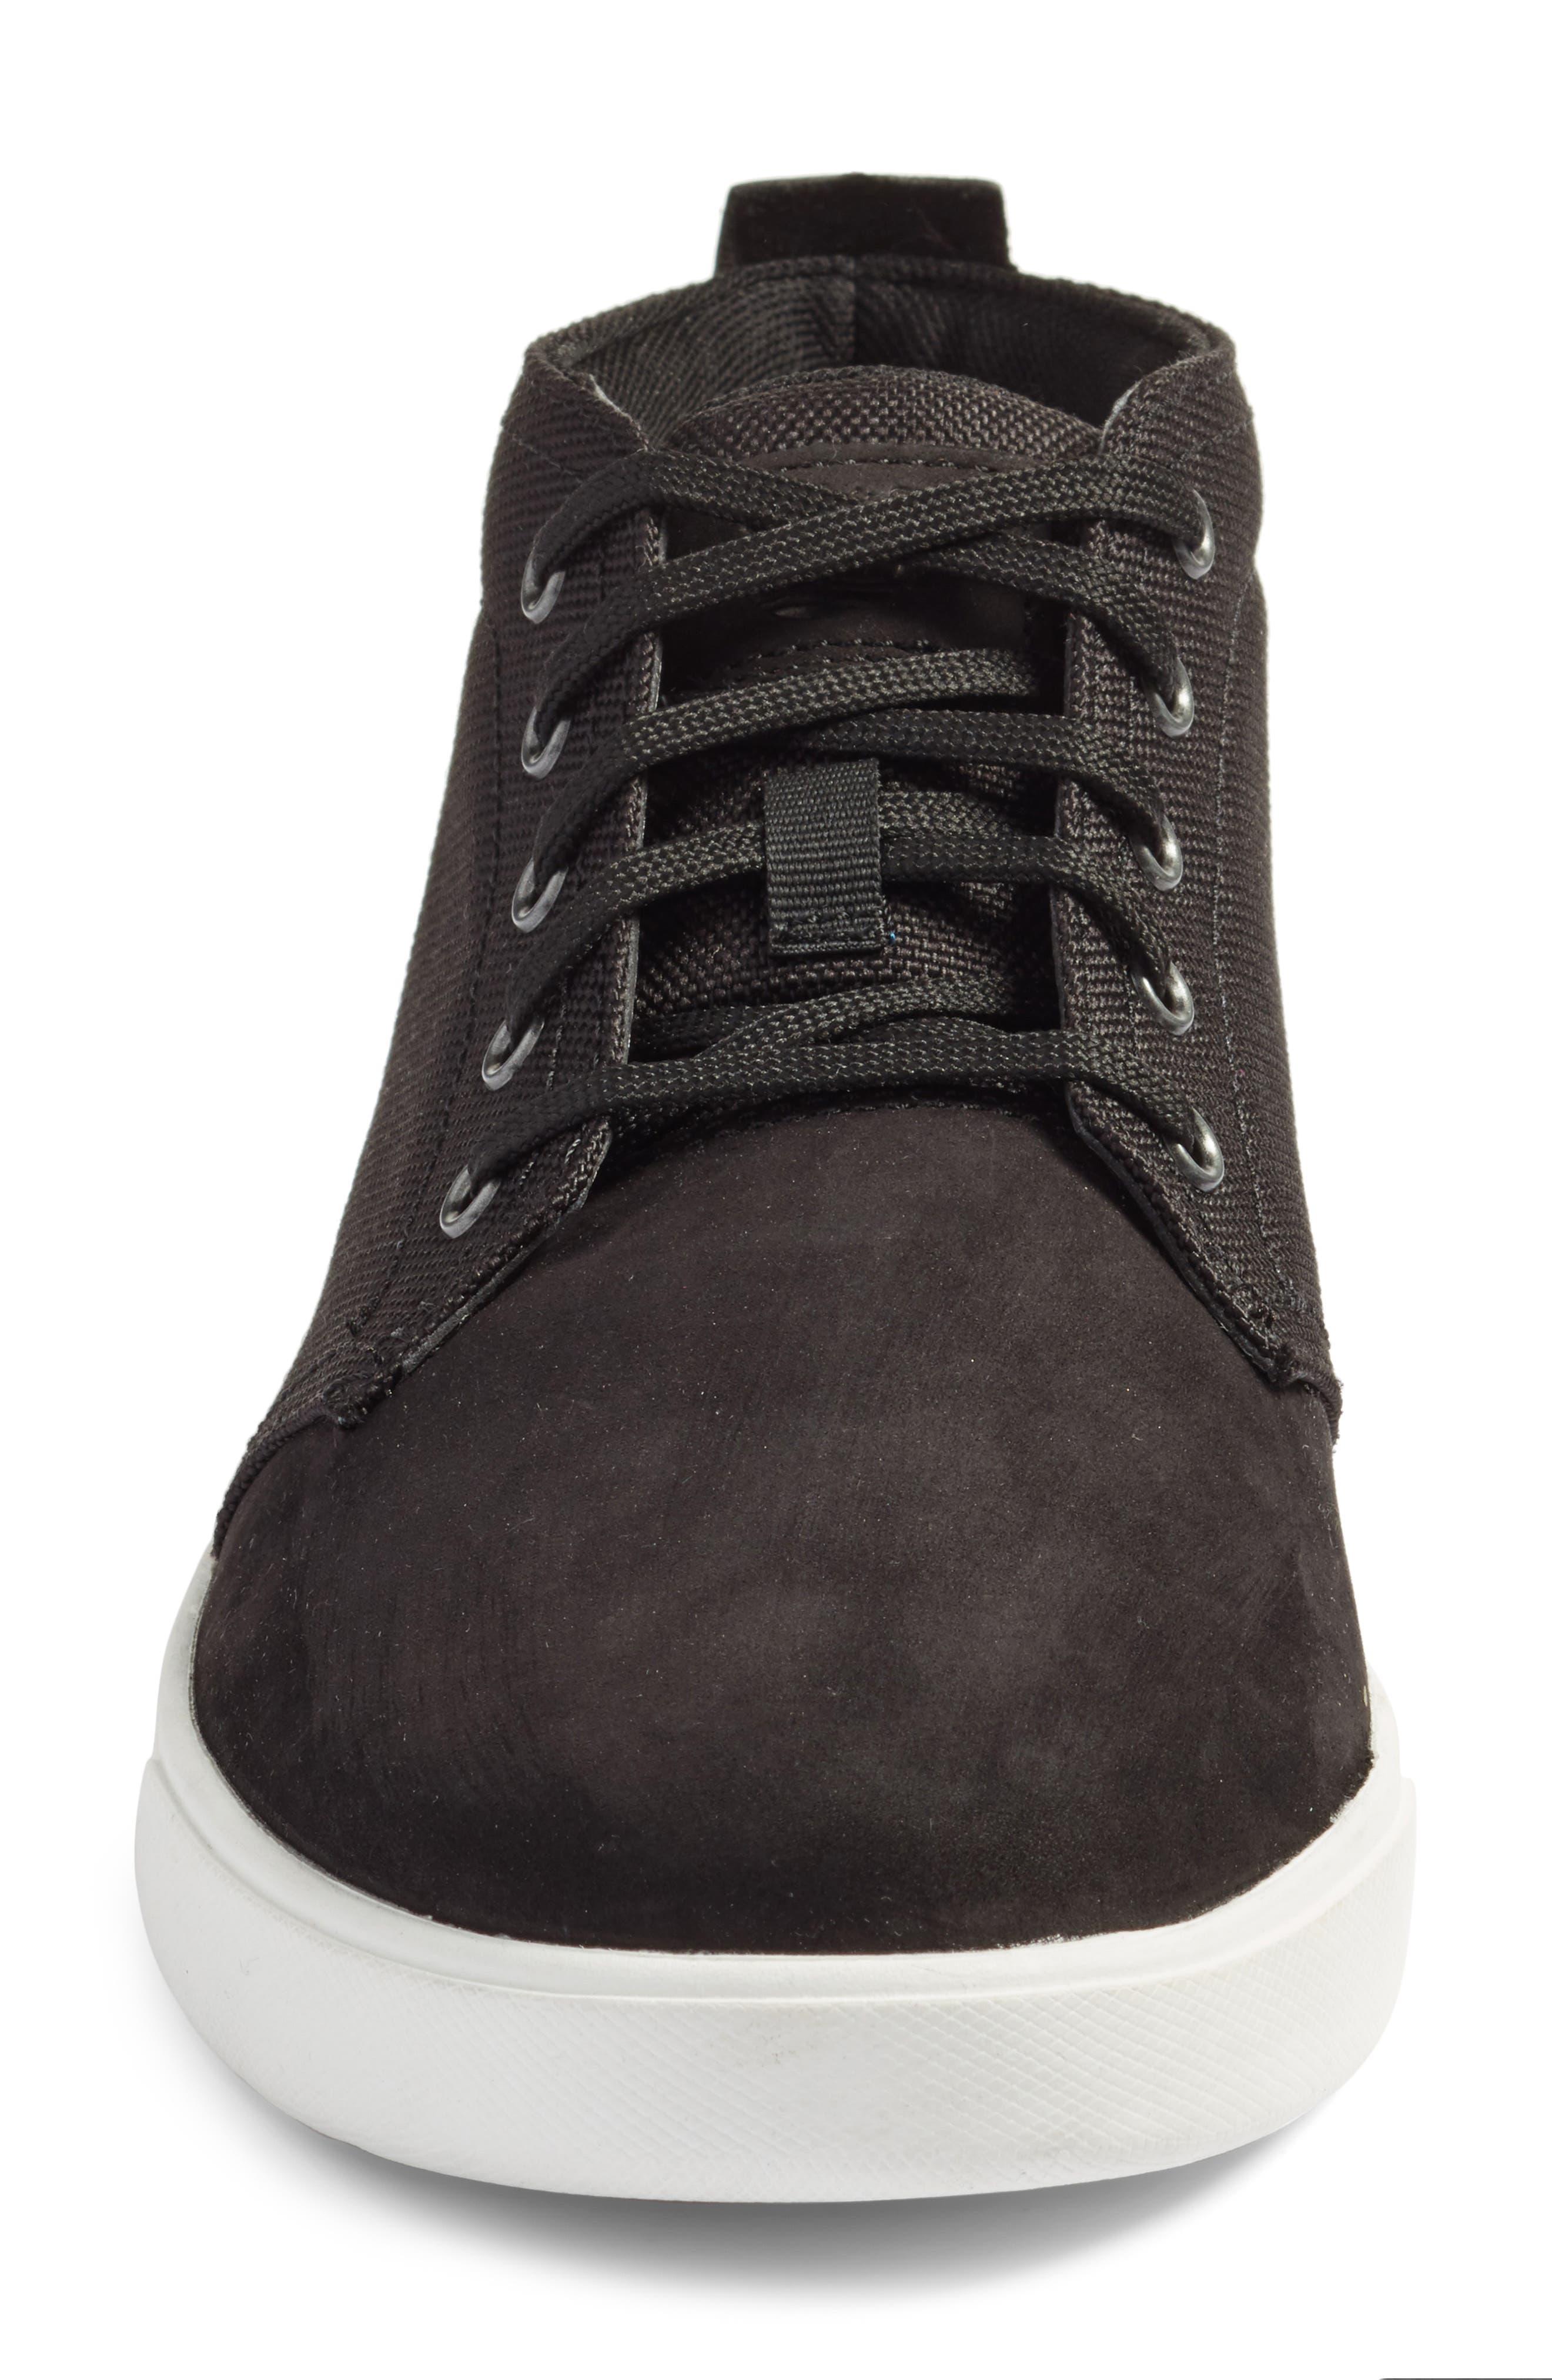 Earthkeepers<sup>™</sup> 'Groveton' Chukka Sneaker,                             Alternate thumbnail 4, color,                             Black Nubuck/ Canvas